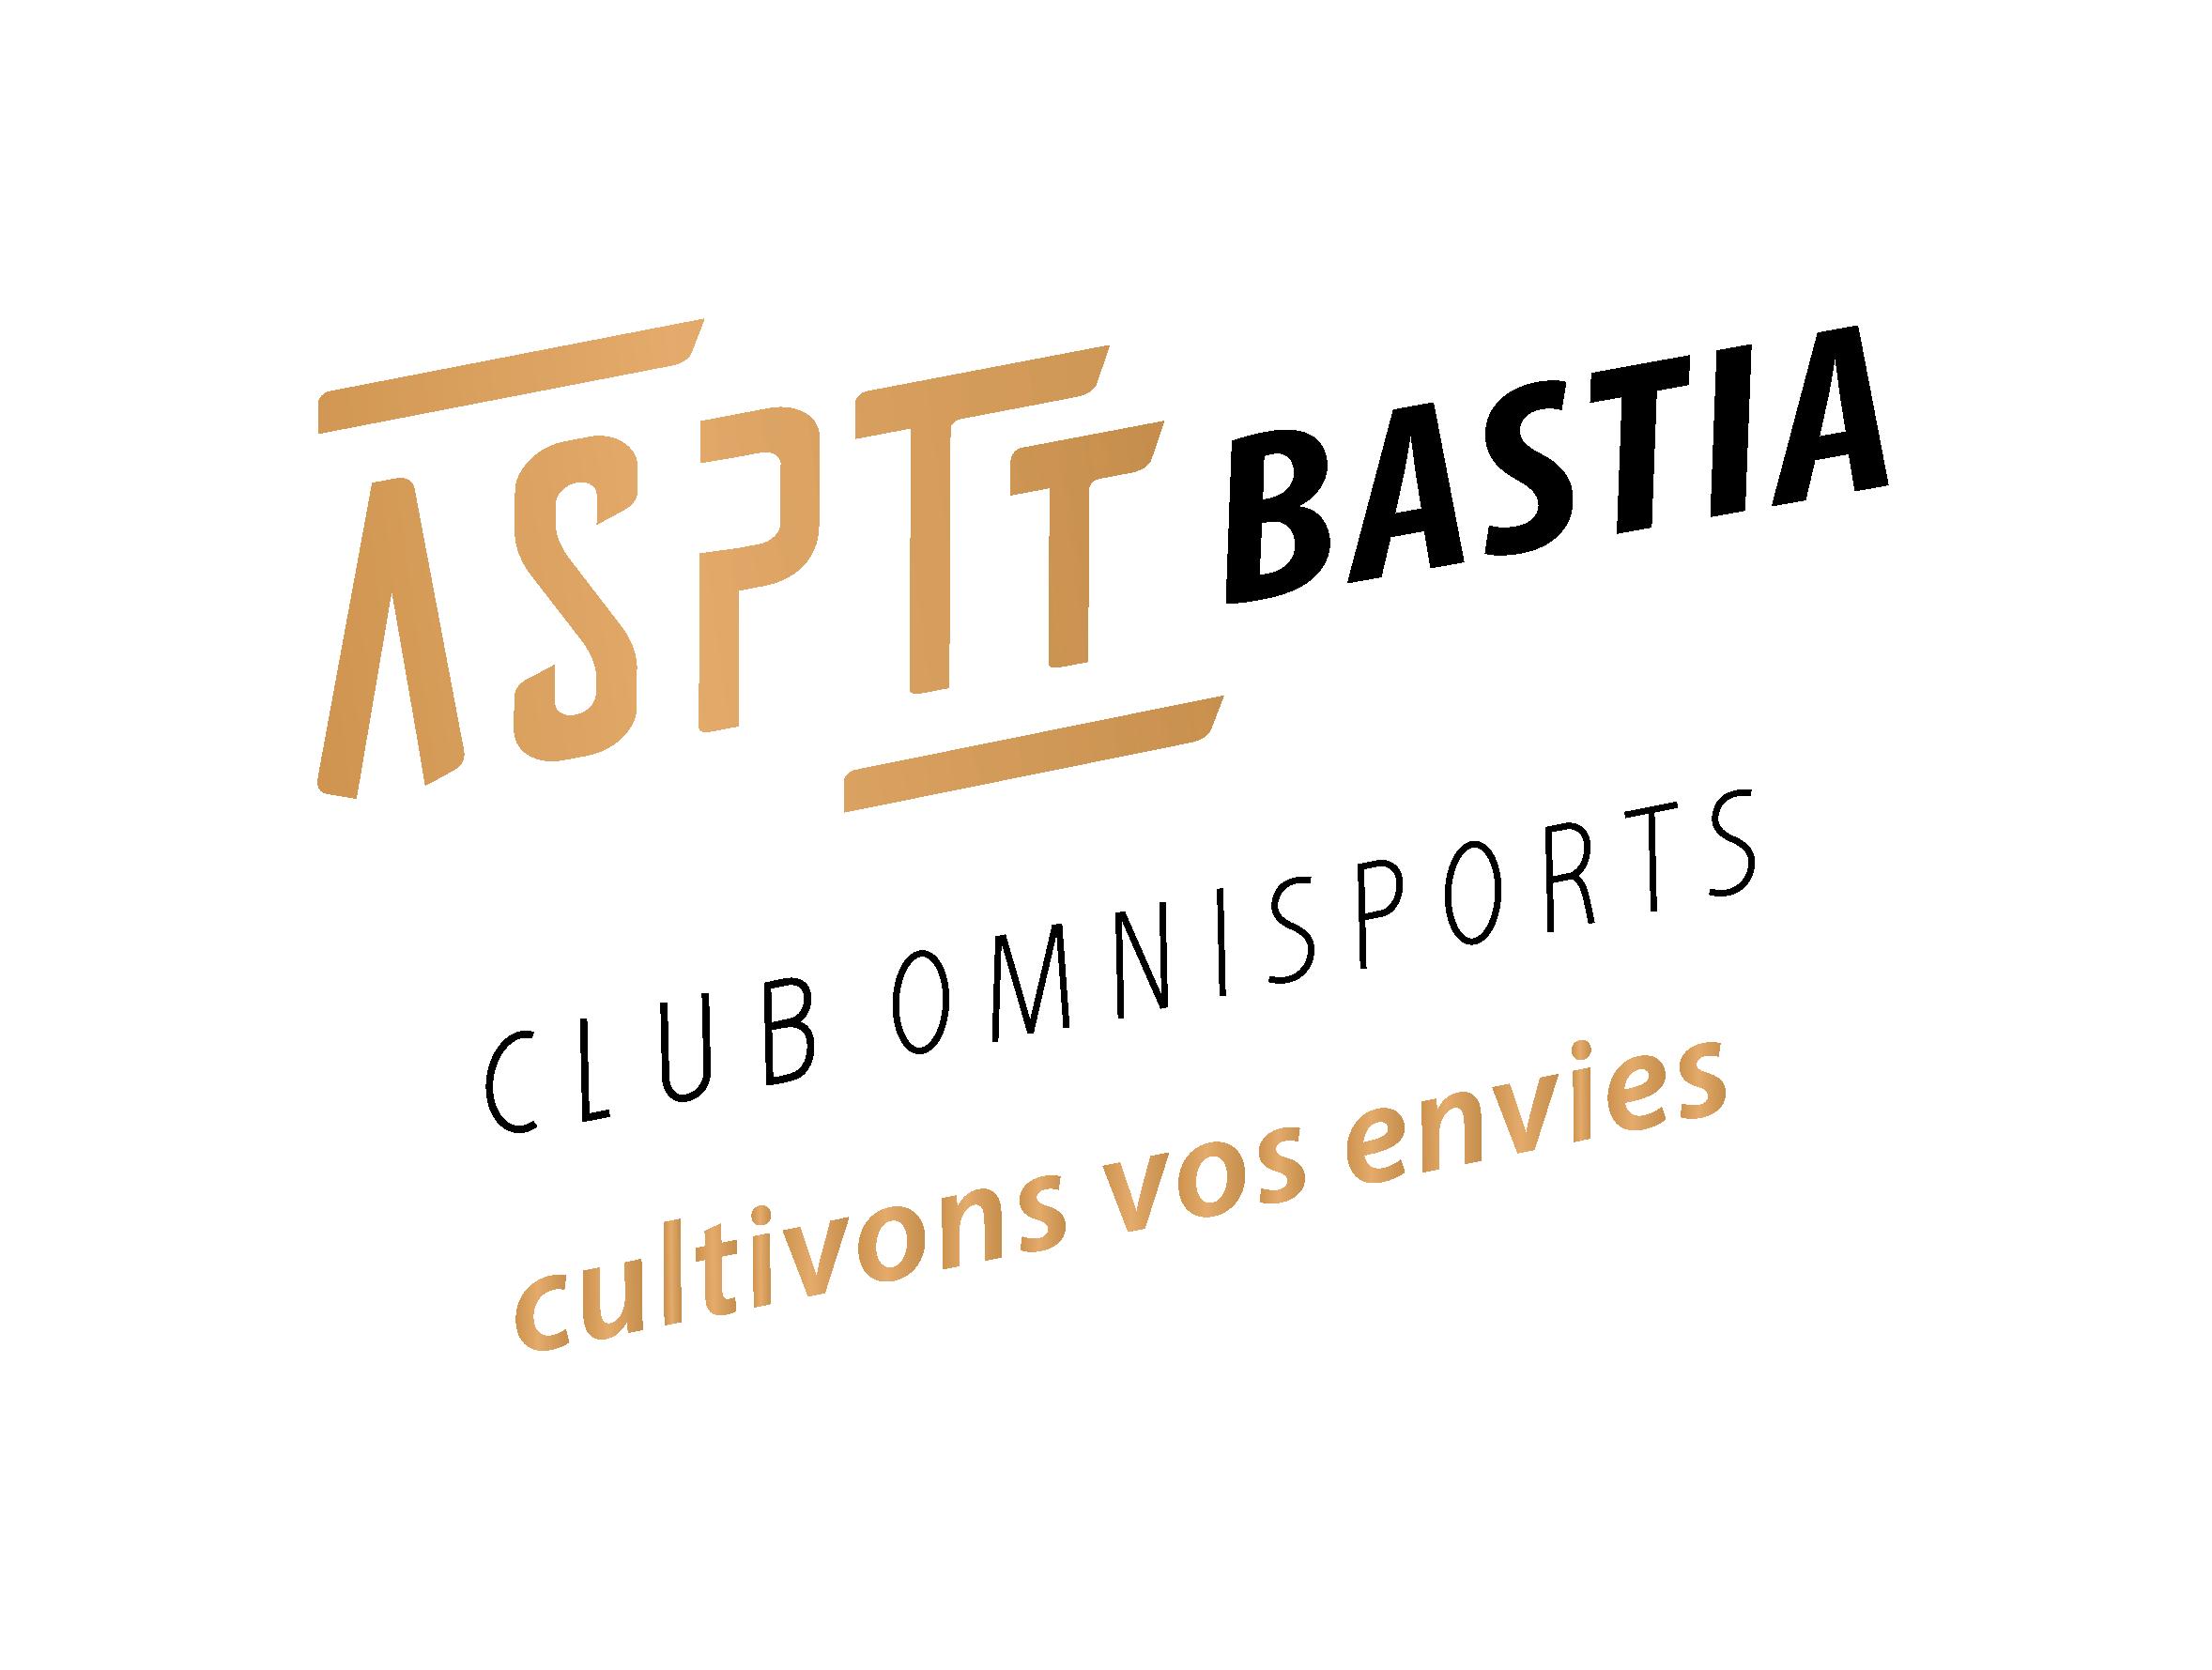 ASPTT BASTIA NATATION